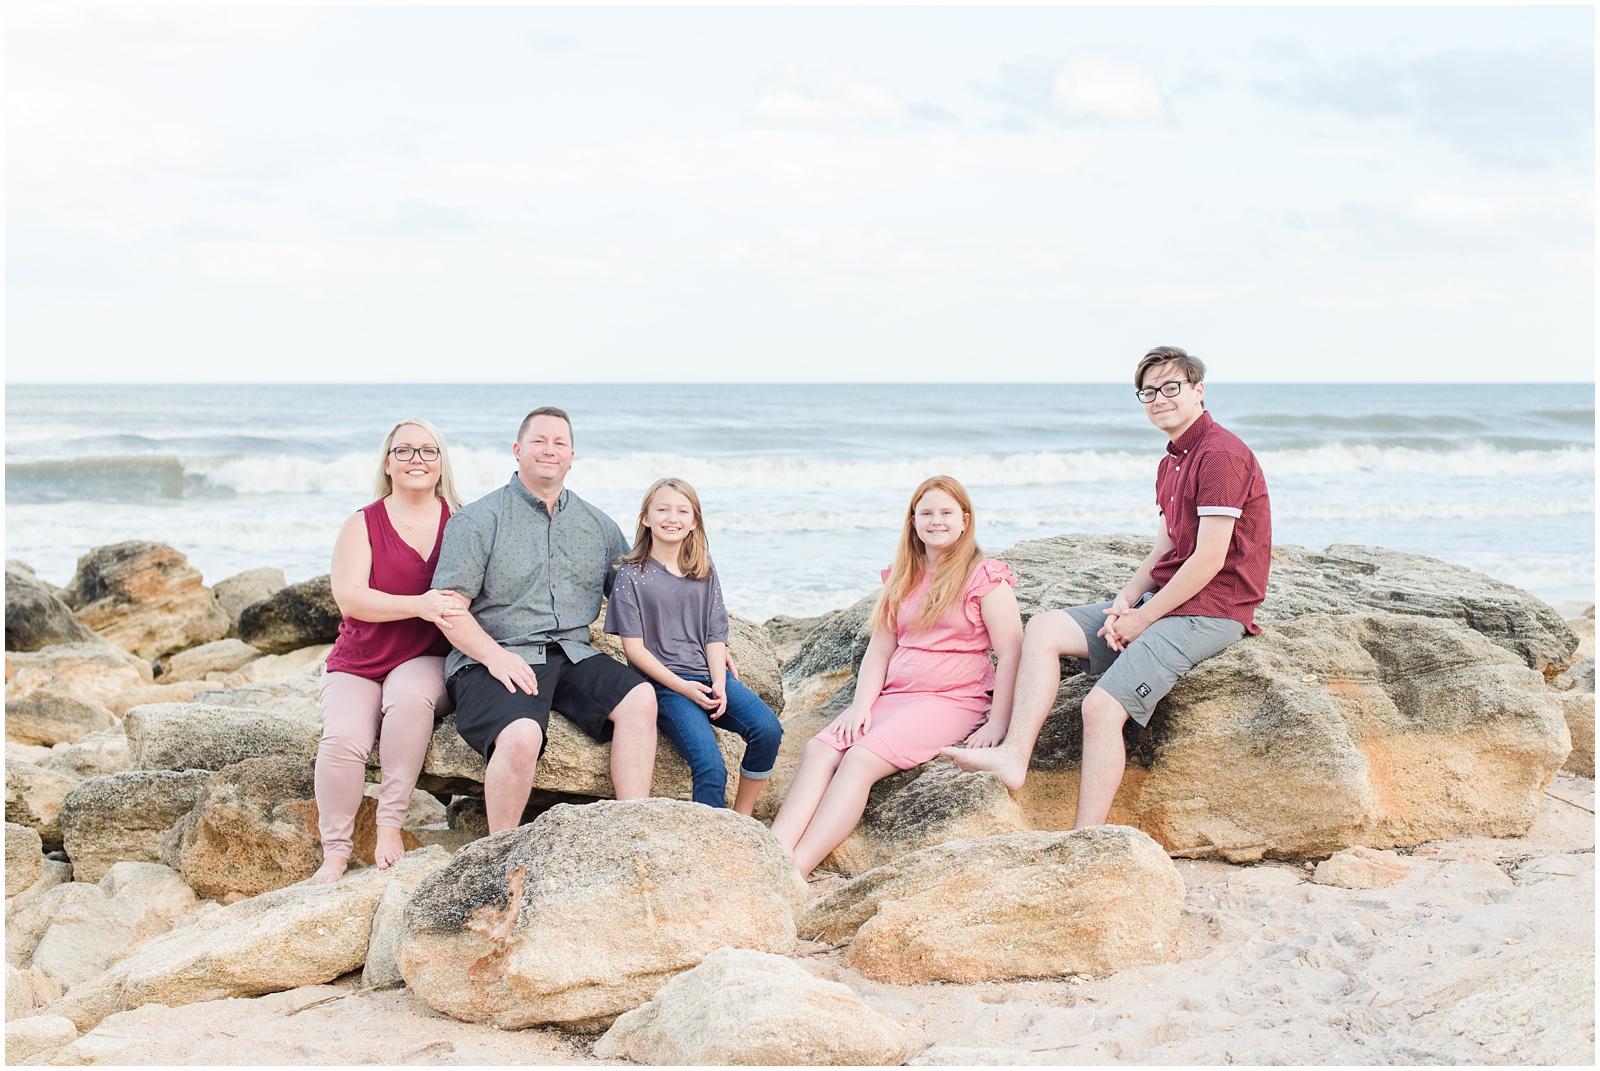 Washington Oaks_Garden_State Park_Beach_Family_Portraits_10.jpg